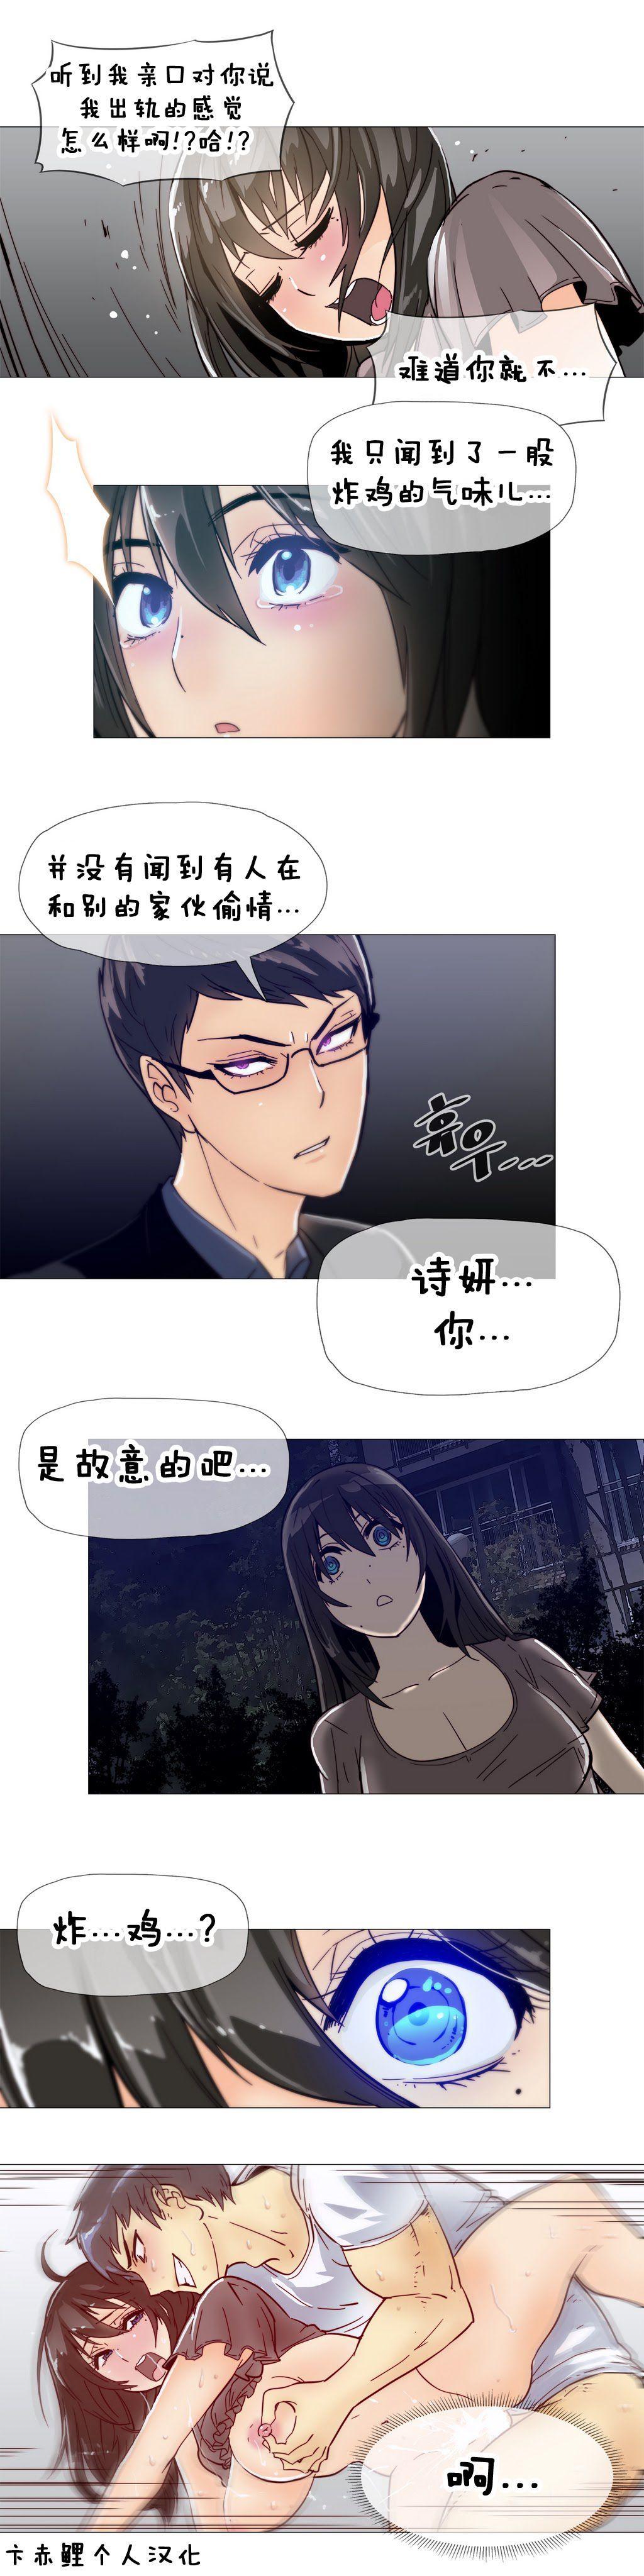 HouseHold Affairs 【卞赤鲤个人汉化】1~33话(持续更新中) 225